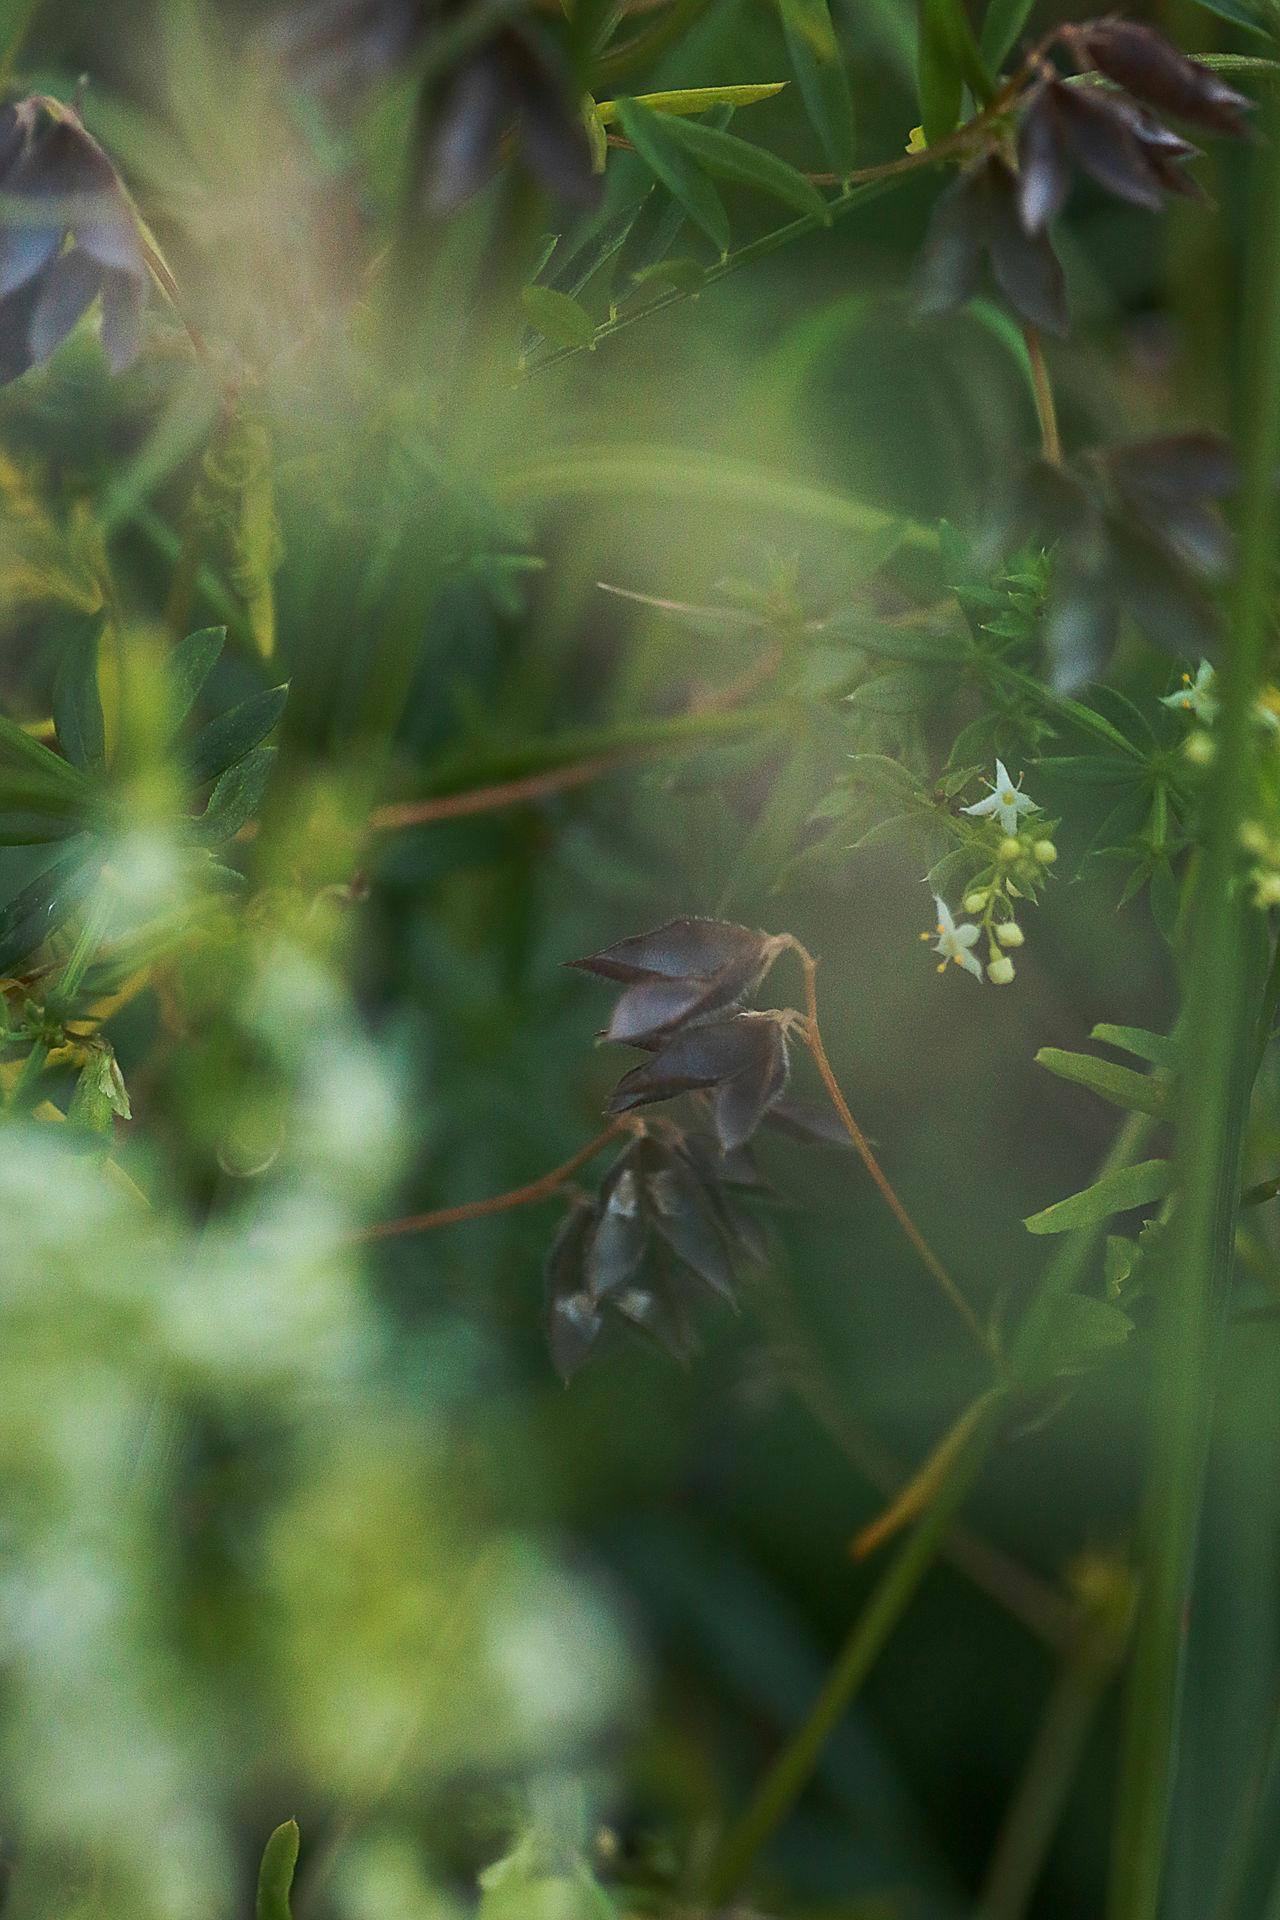 Beauty In Nature Close-up Hidden Beauty Hiddew Macro Photography Nature Plant Secret Shadows